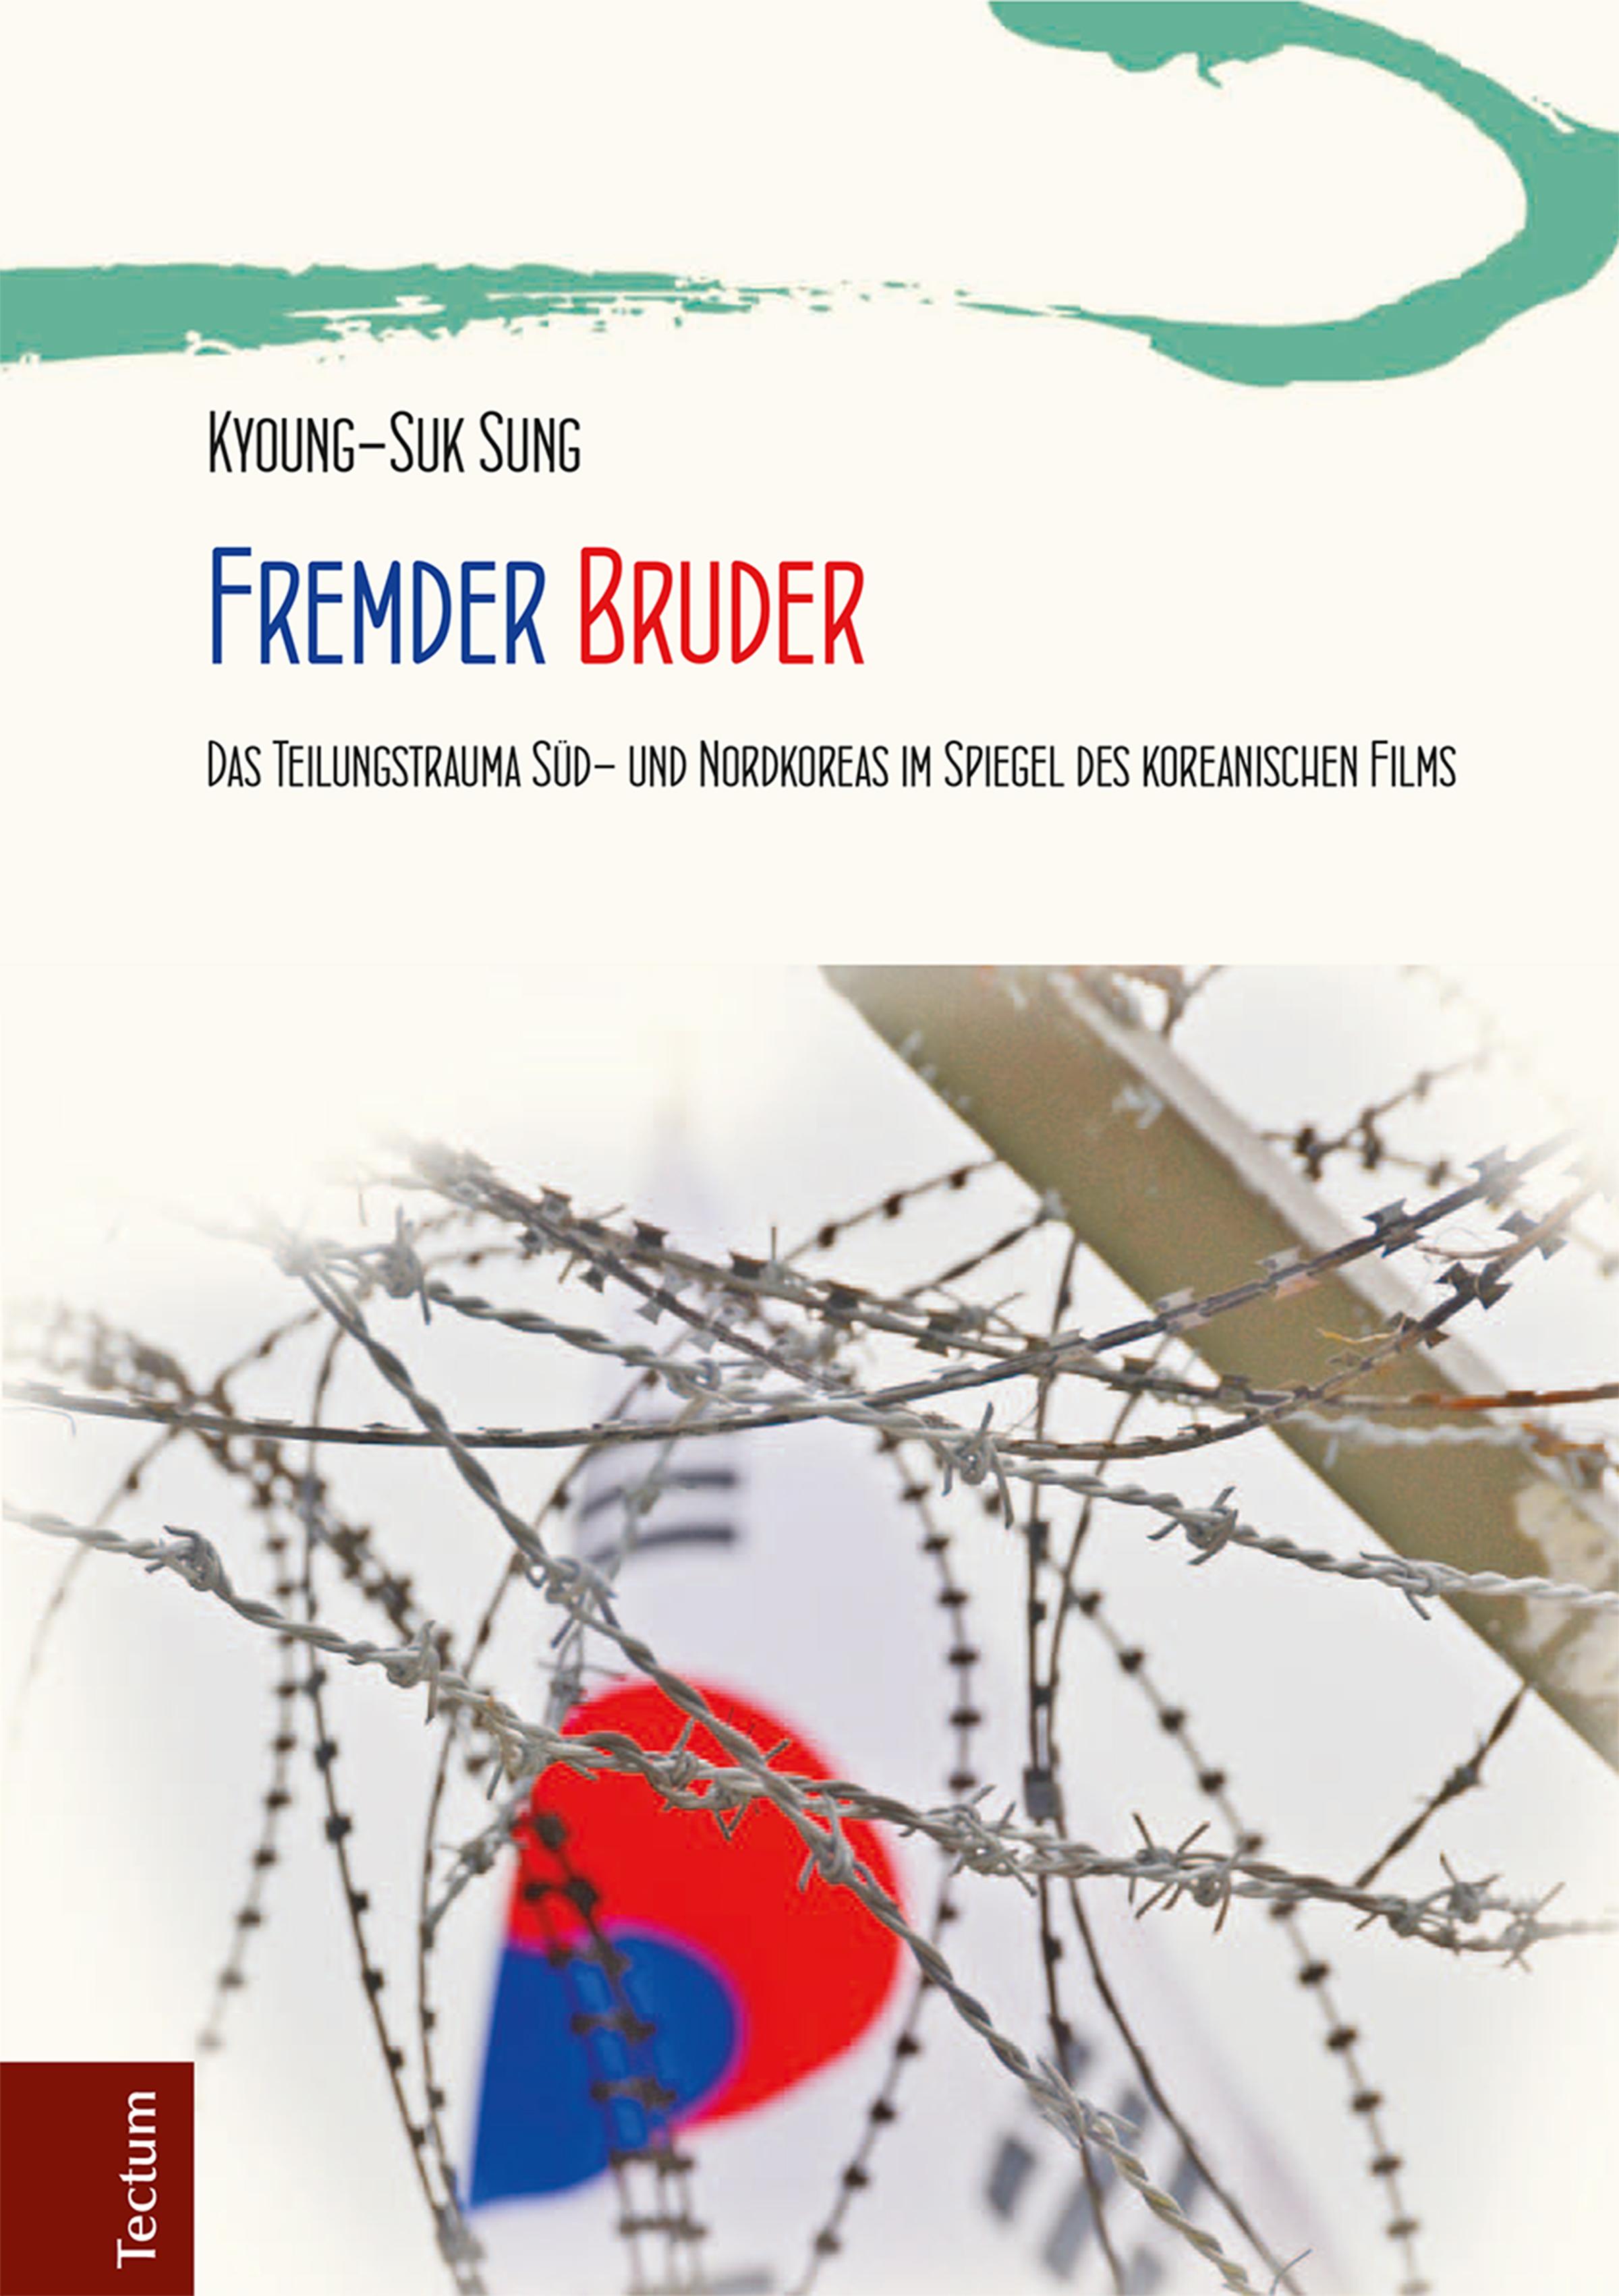 цена на Kyoung-Suk Sung Fremder Bruder